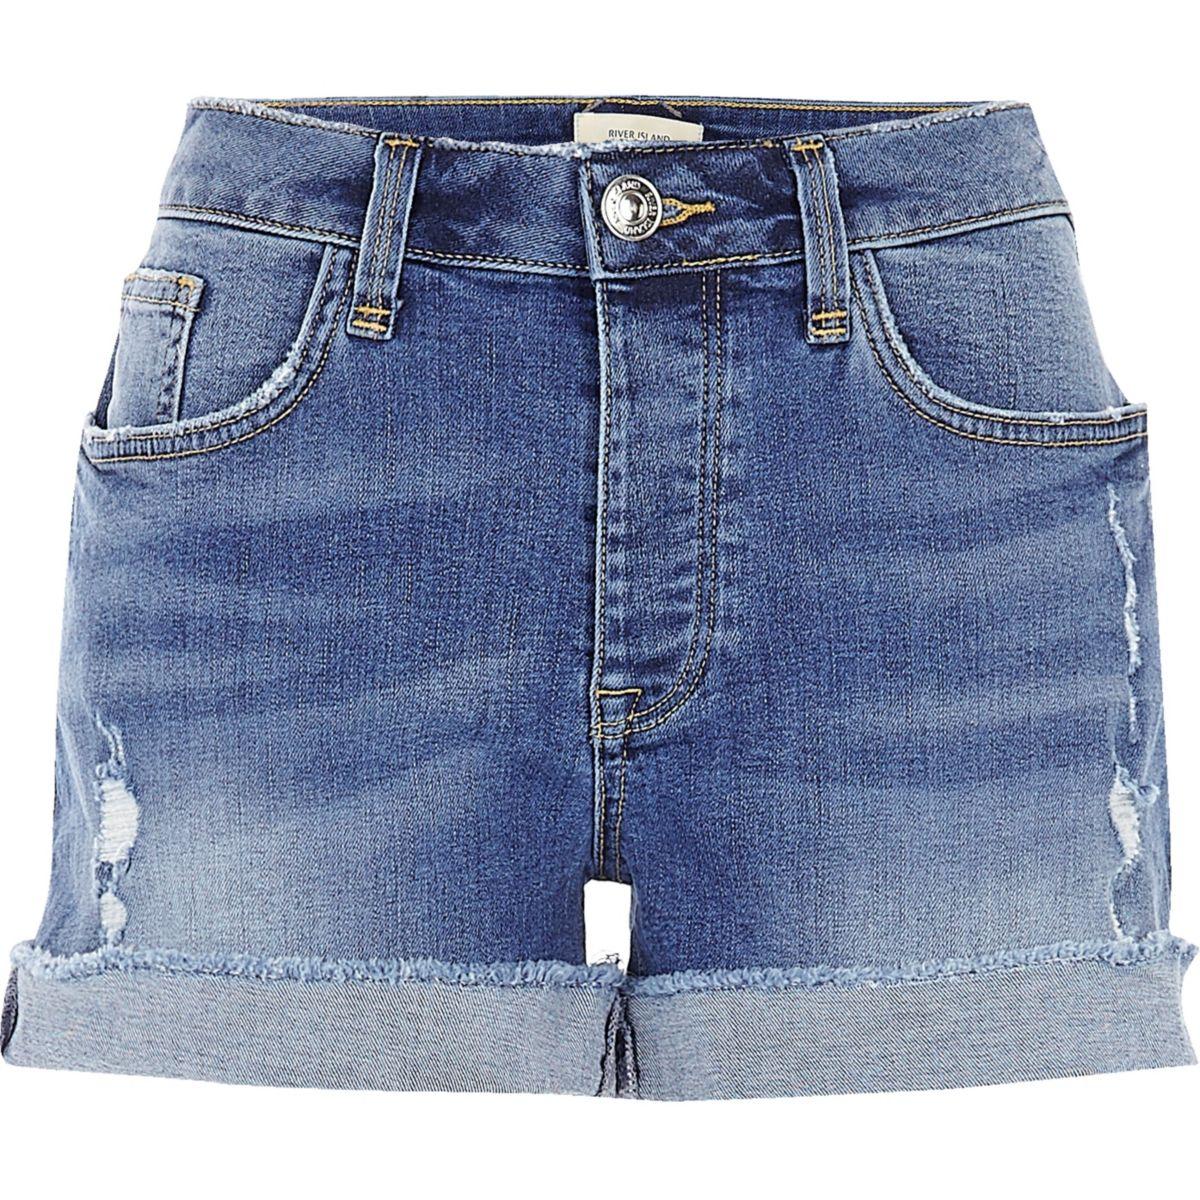 Mid wash boyfriend fit denim shorts